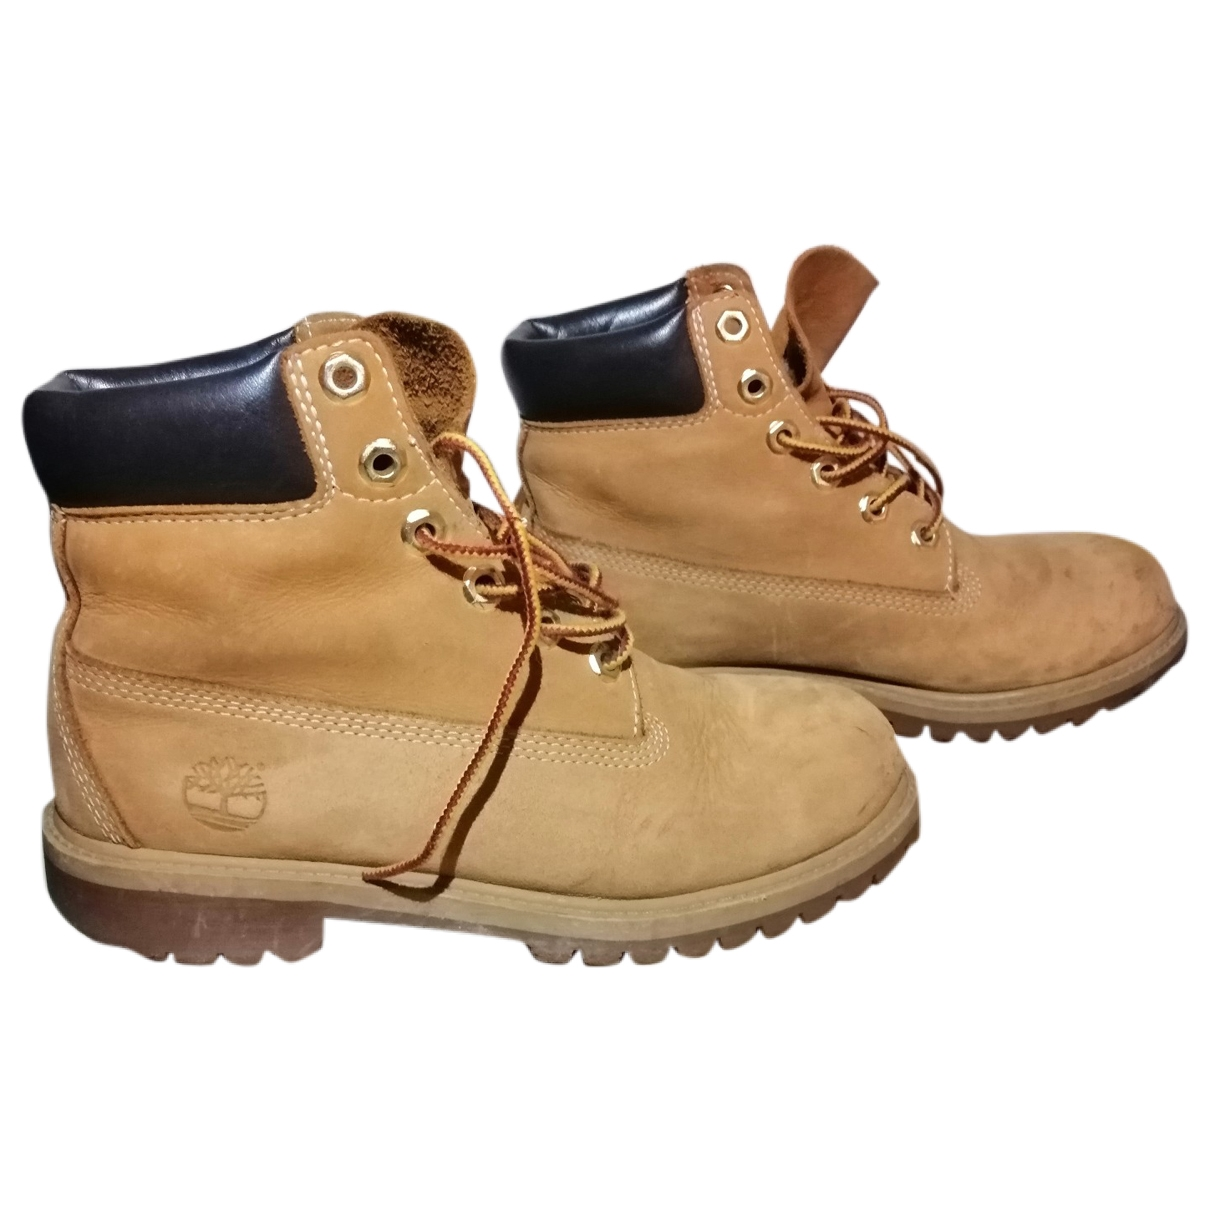 Timberland - Boots   pour femme en suede - camel